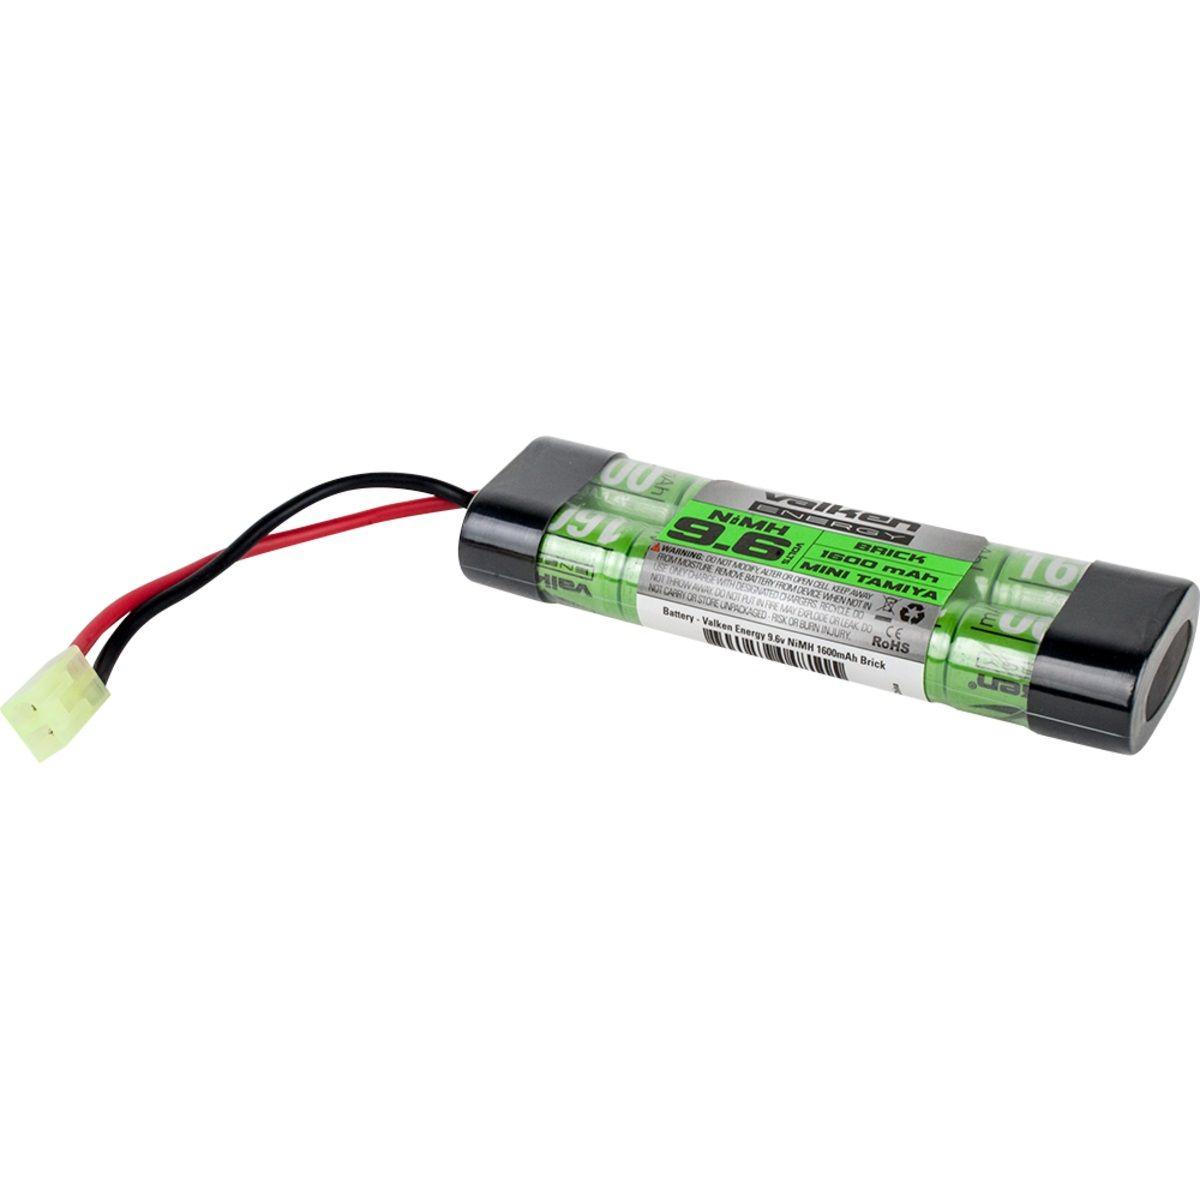 Valken Energy 9 6v 1600mah Nimh Mini Brick Battery Nimh Airsoft Battery Battery Maintenance